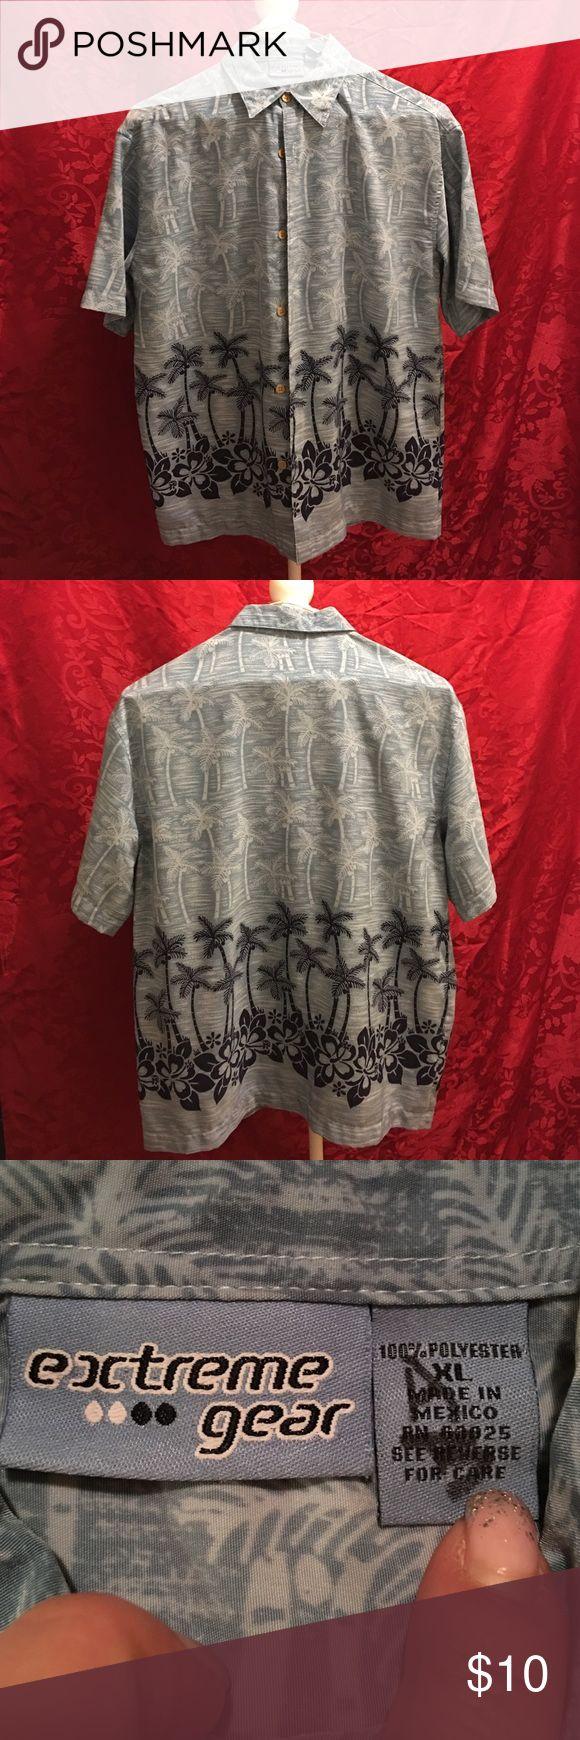 Boys Hawaiian shirt Boys Hawaiian shirt. Hundred percent polyester. No trade/no PayPal. 10% bundle discount. Extreme Gear Shirts & Tops Button Down Shirts